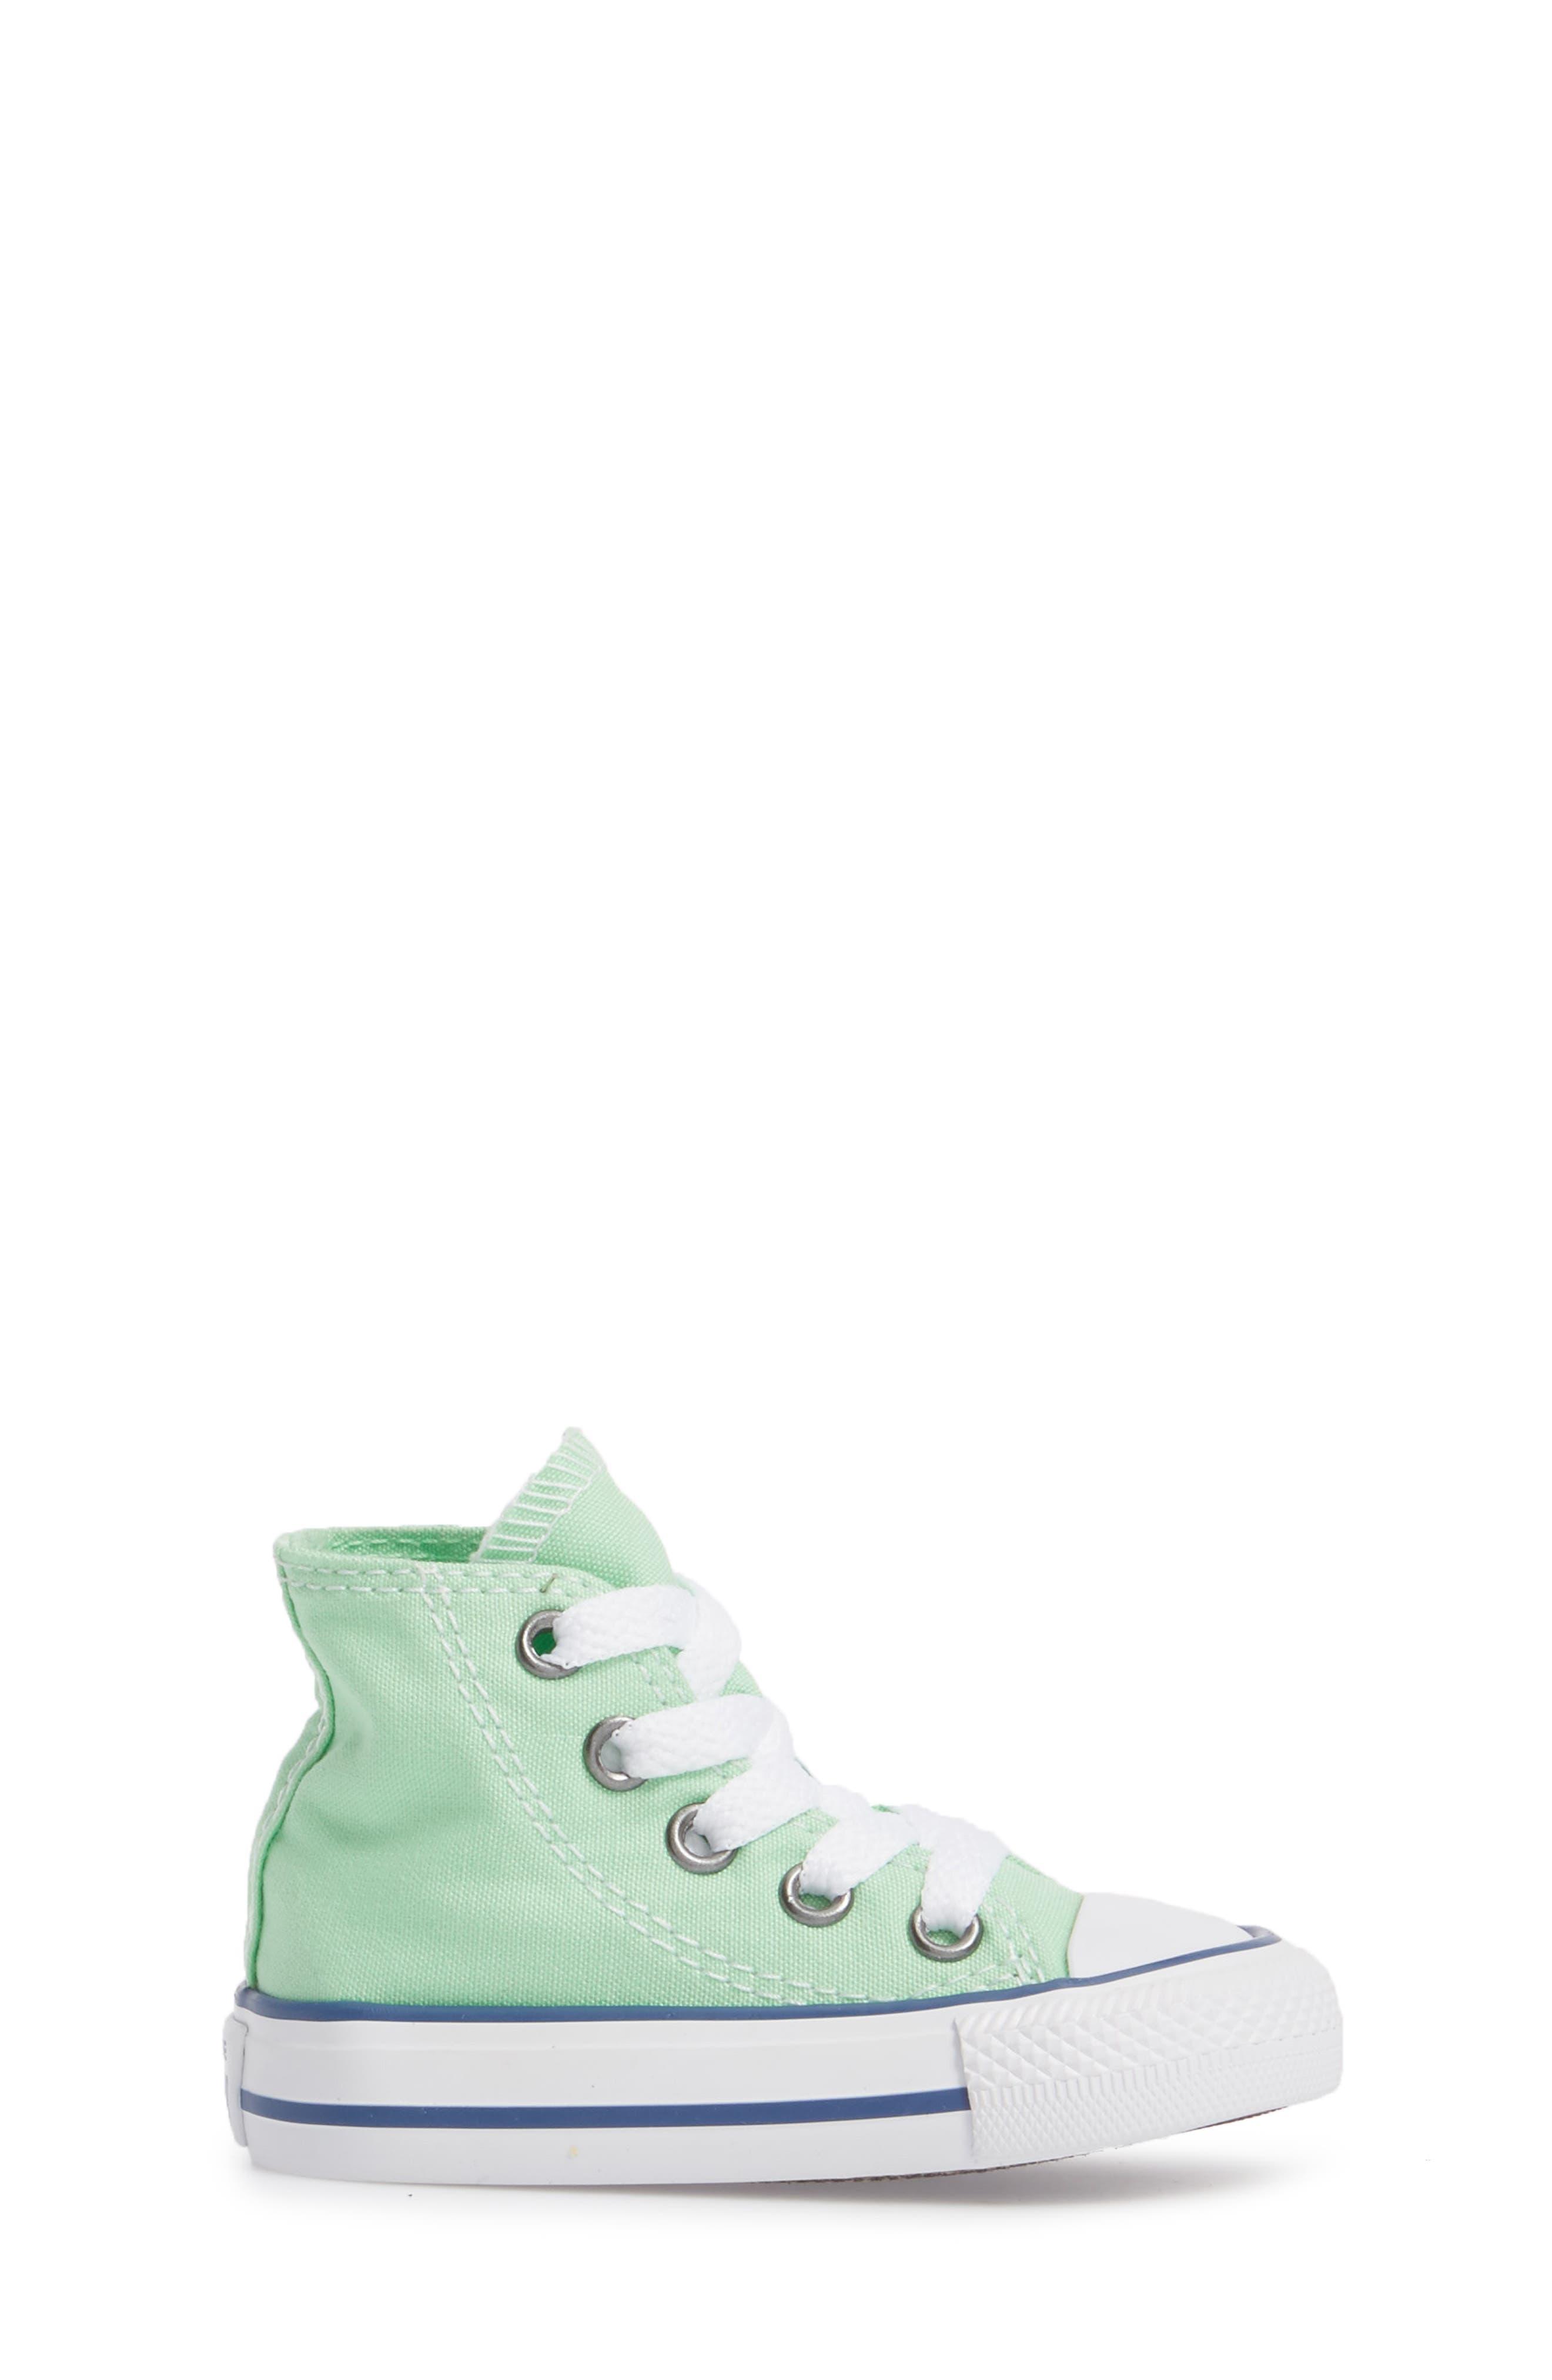 Chuck Taylor<sup>®</sup> All Star<sup>®</sup> Seasonal High Top Sneaker,                             Alternate thumbnail 3, color,                             336